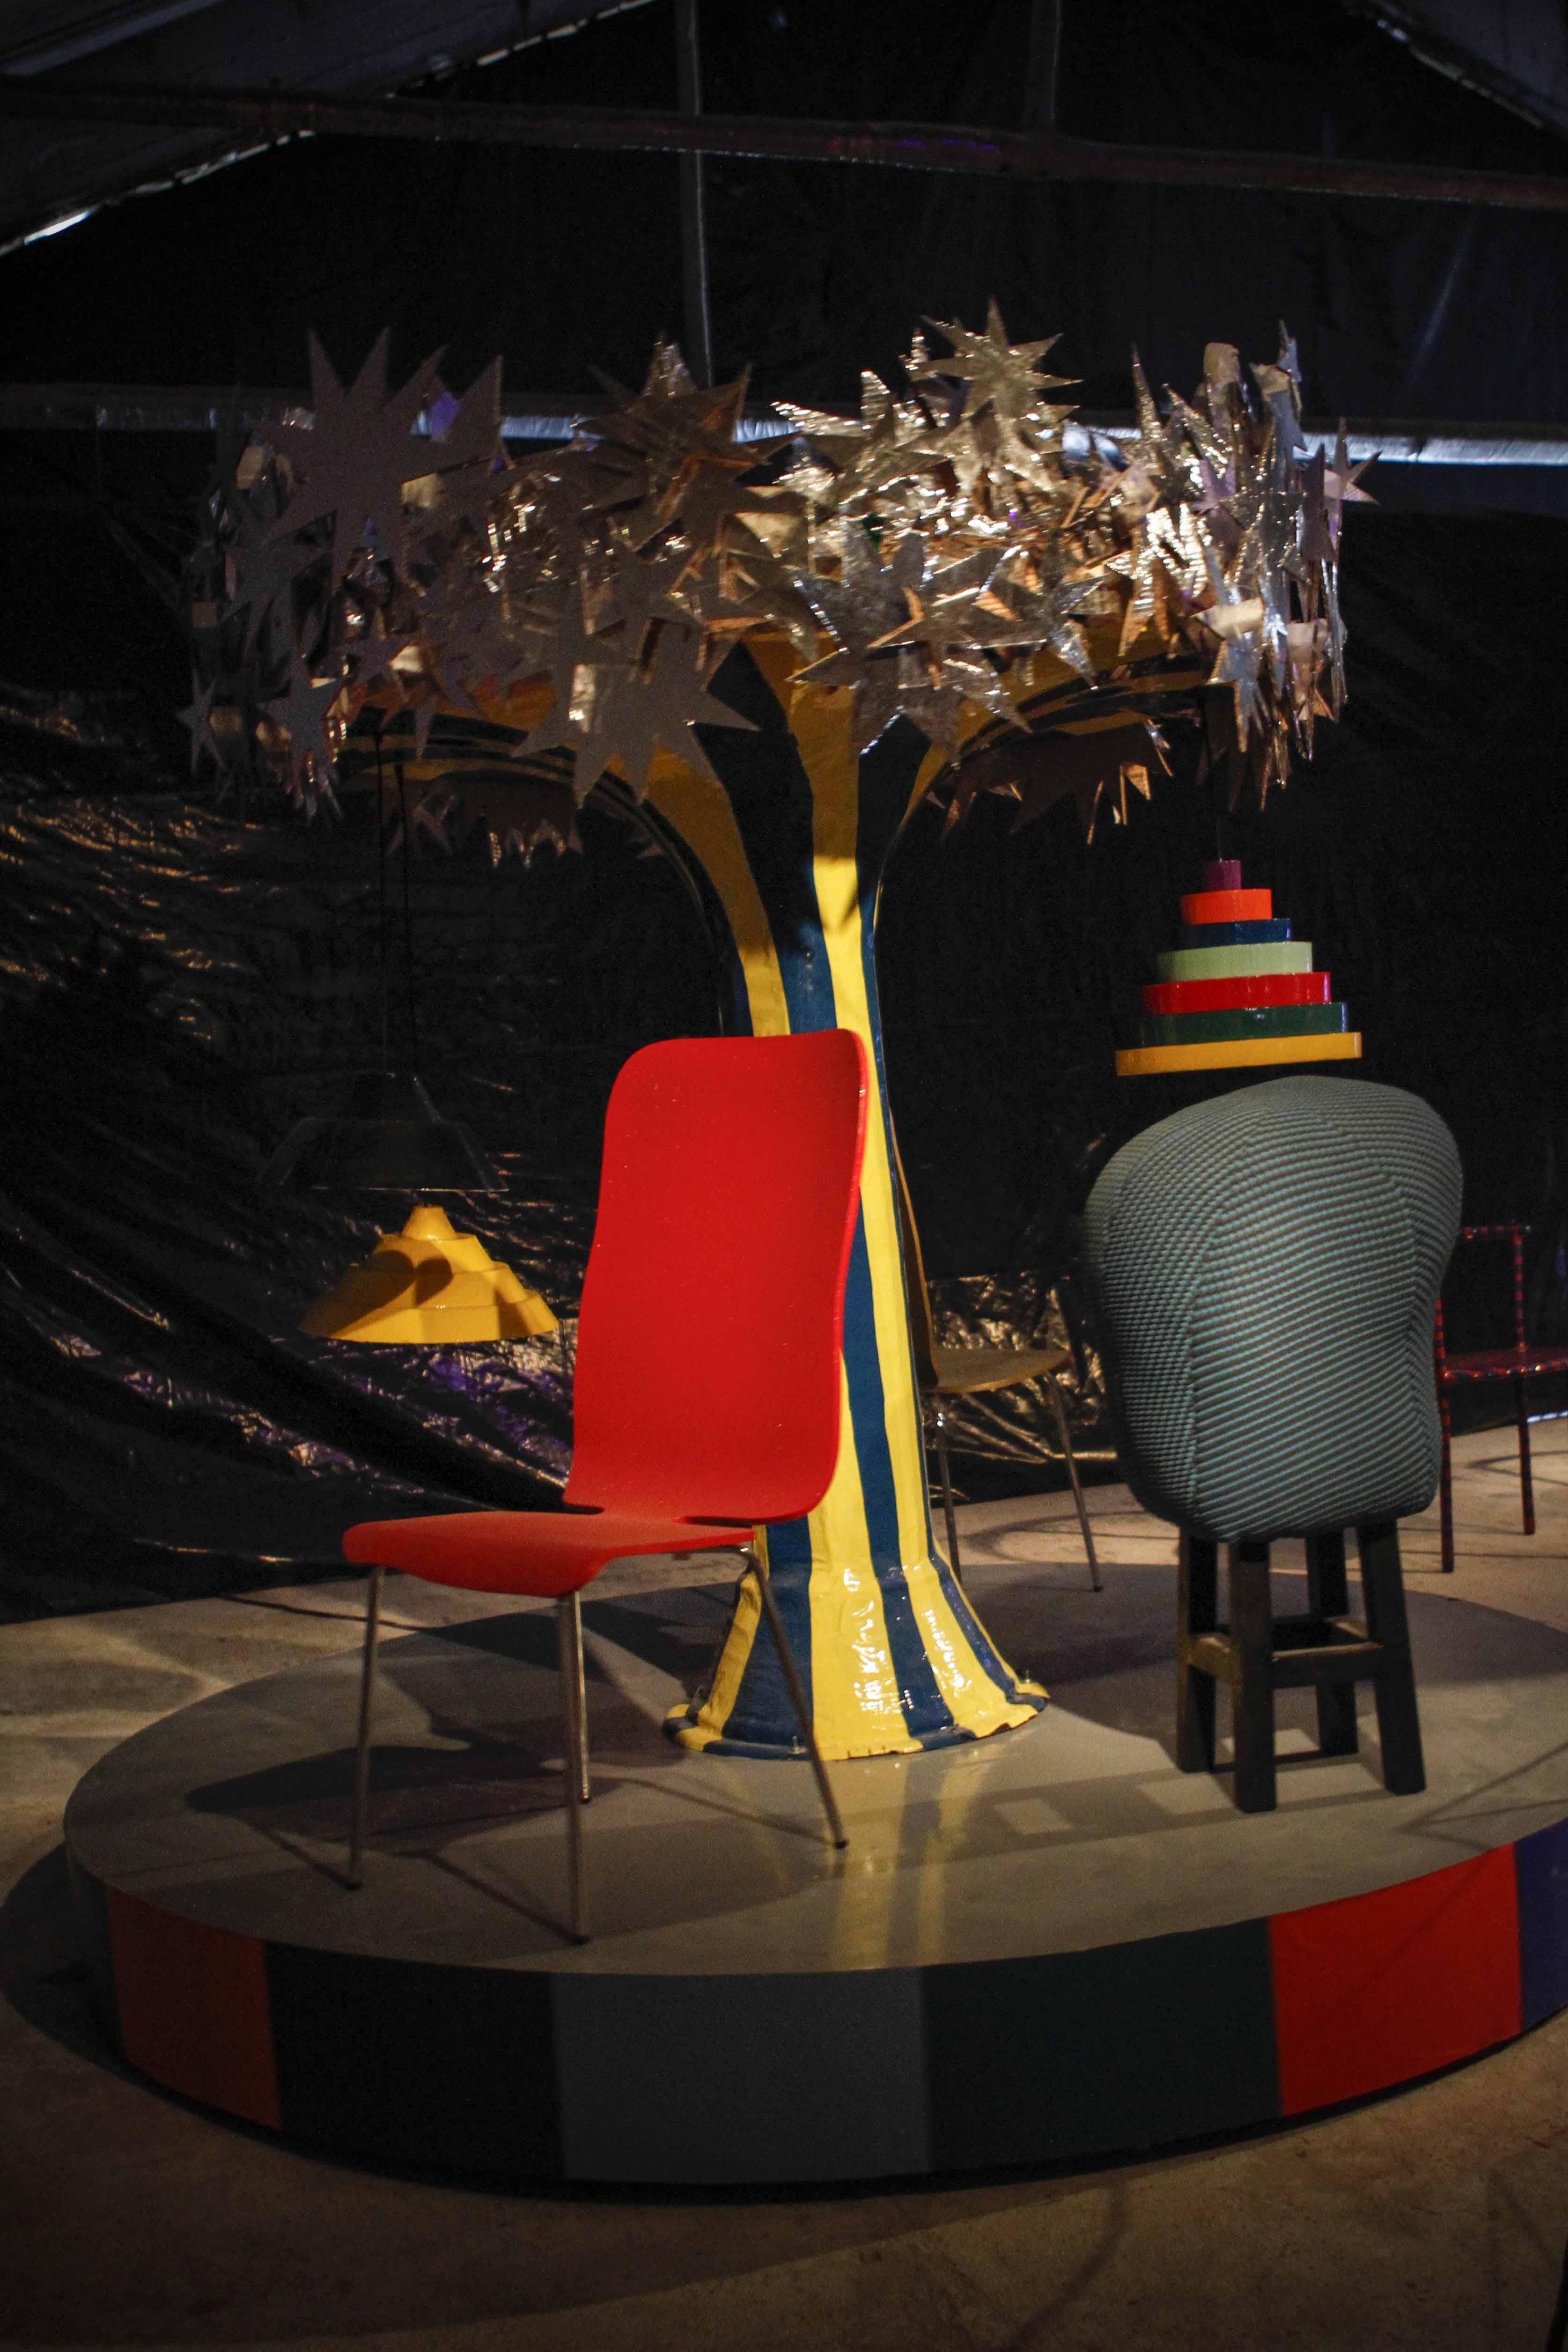 design-meubles-Marteen Baas-milan-decoration-furniture